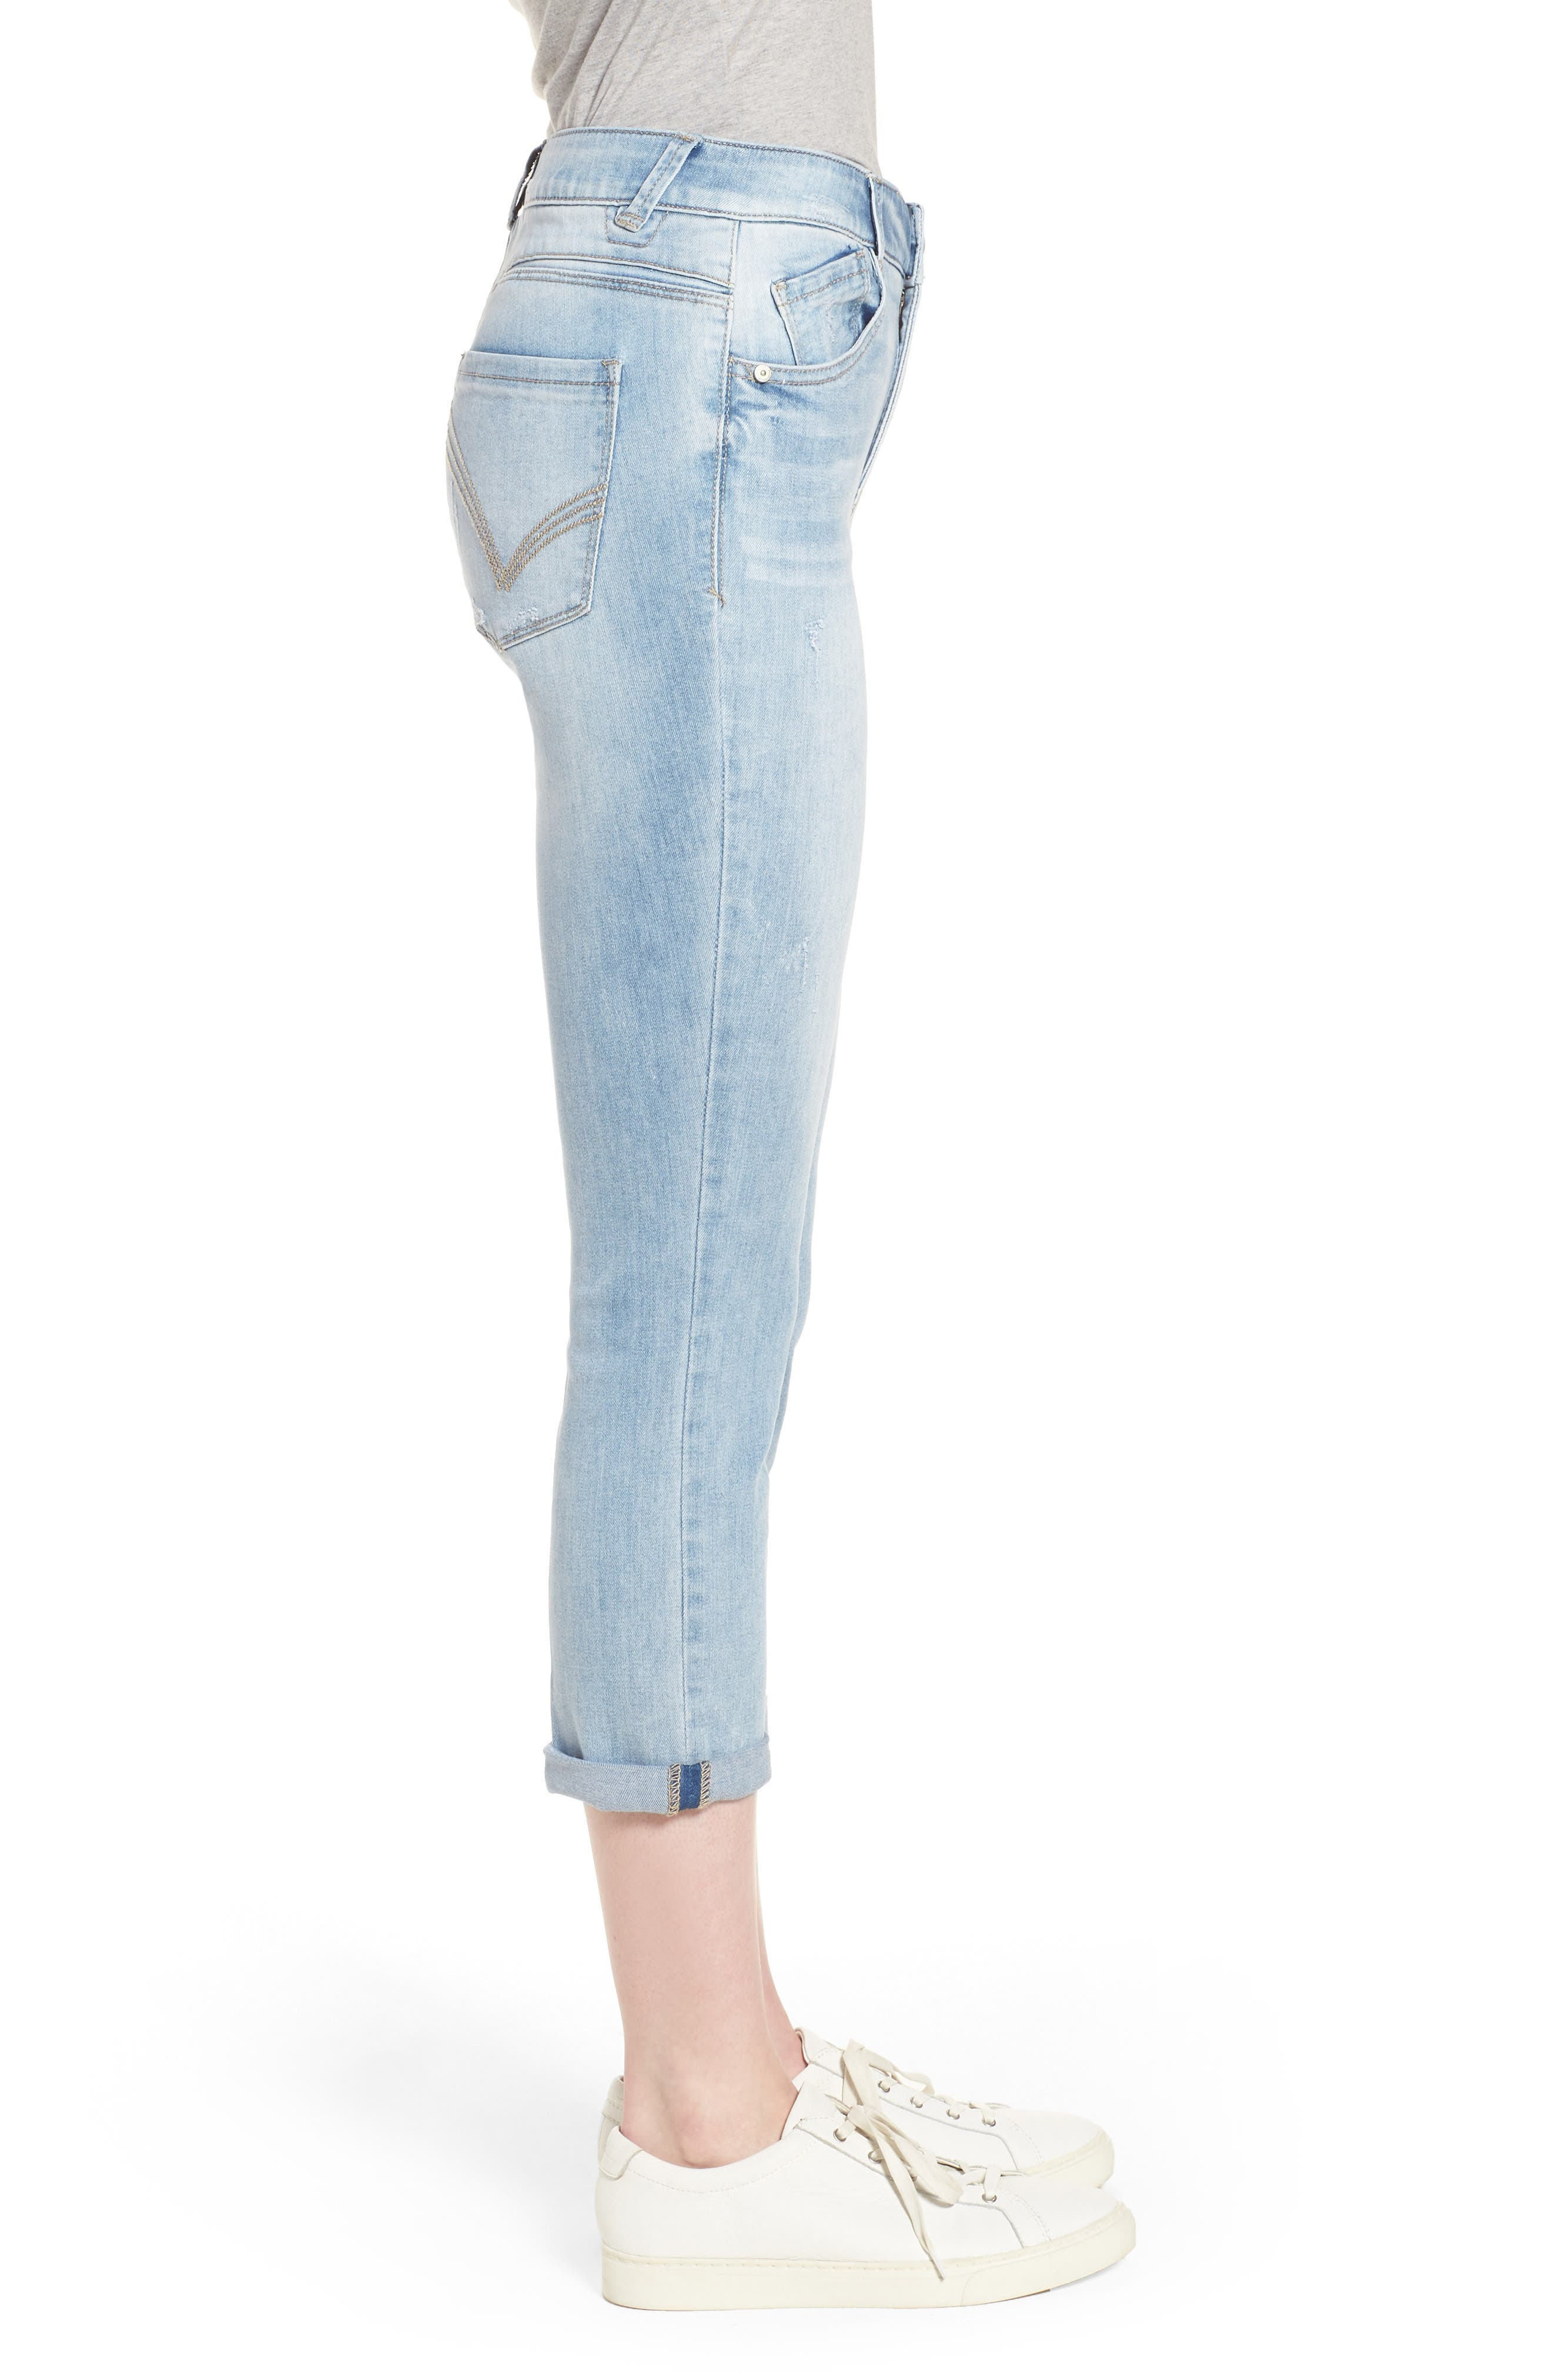 Ab-solution High Rise Crop Jeans,                             Alternate thumbnail 3, color,                             Light Blue